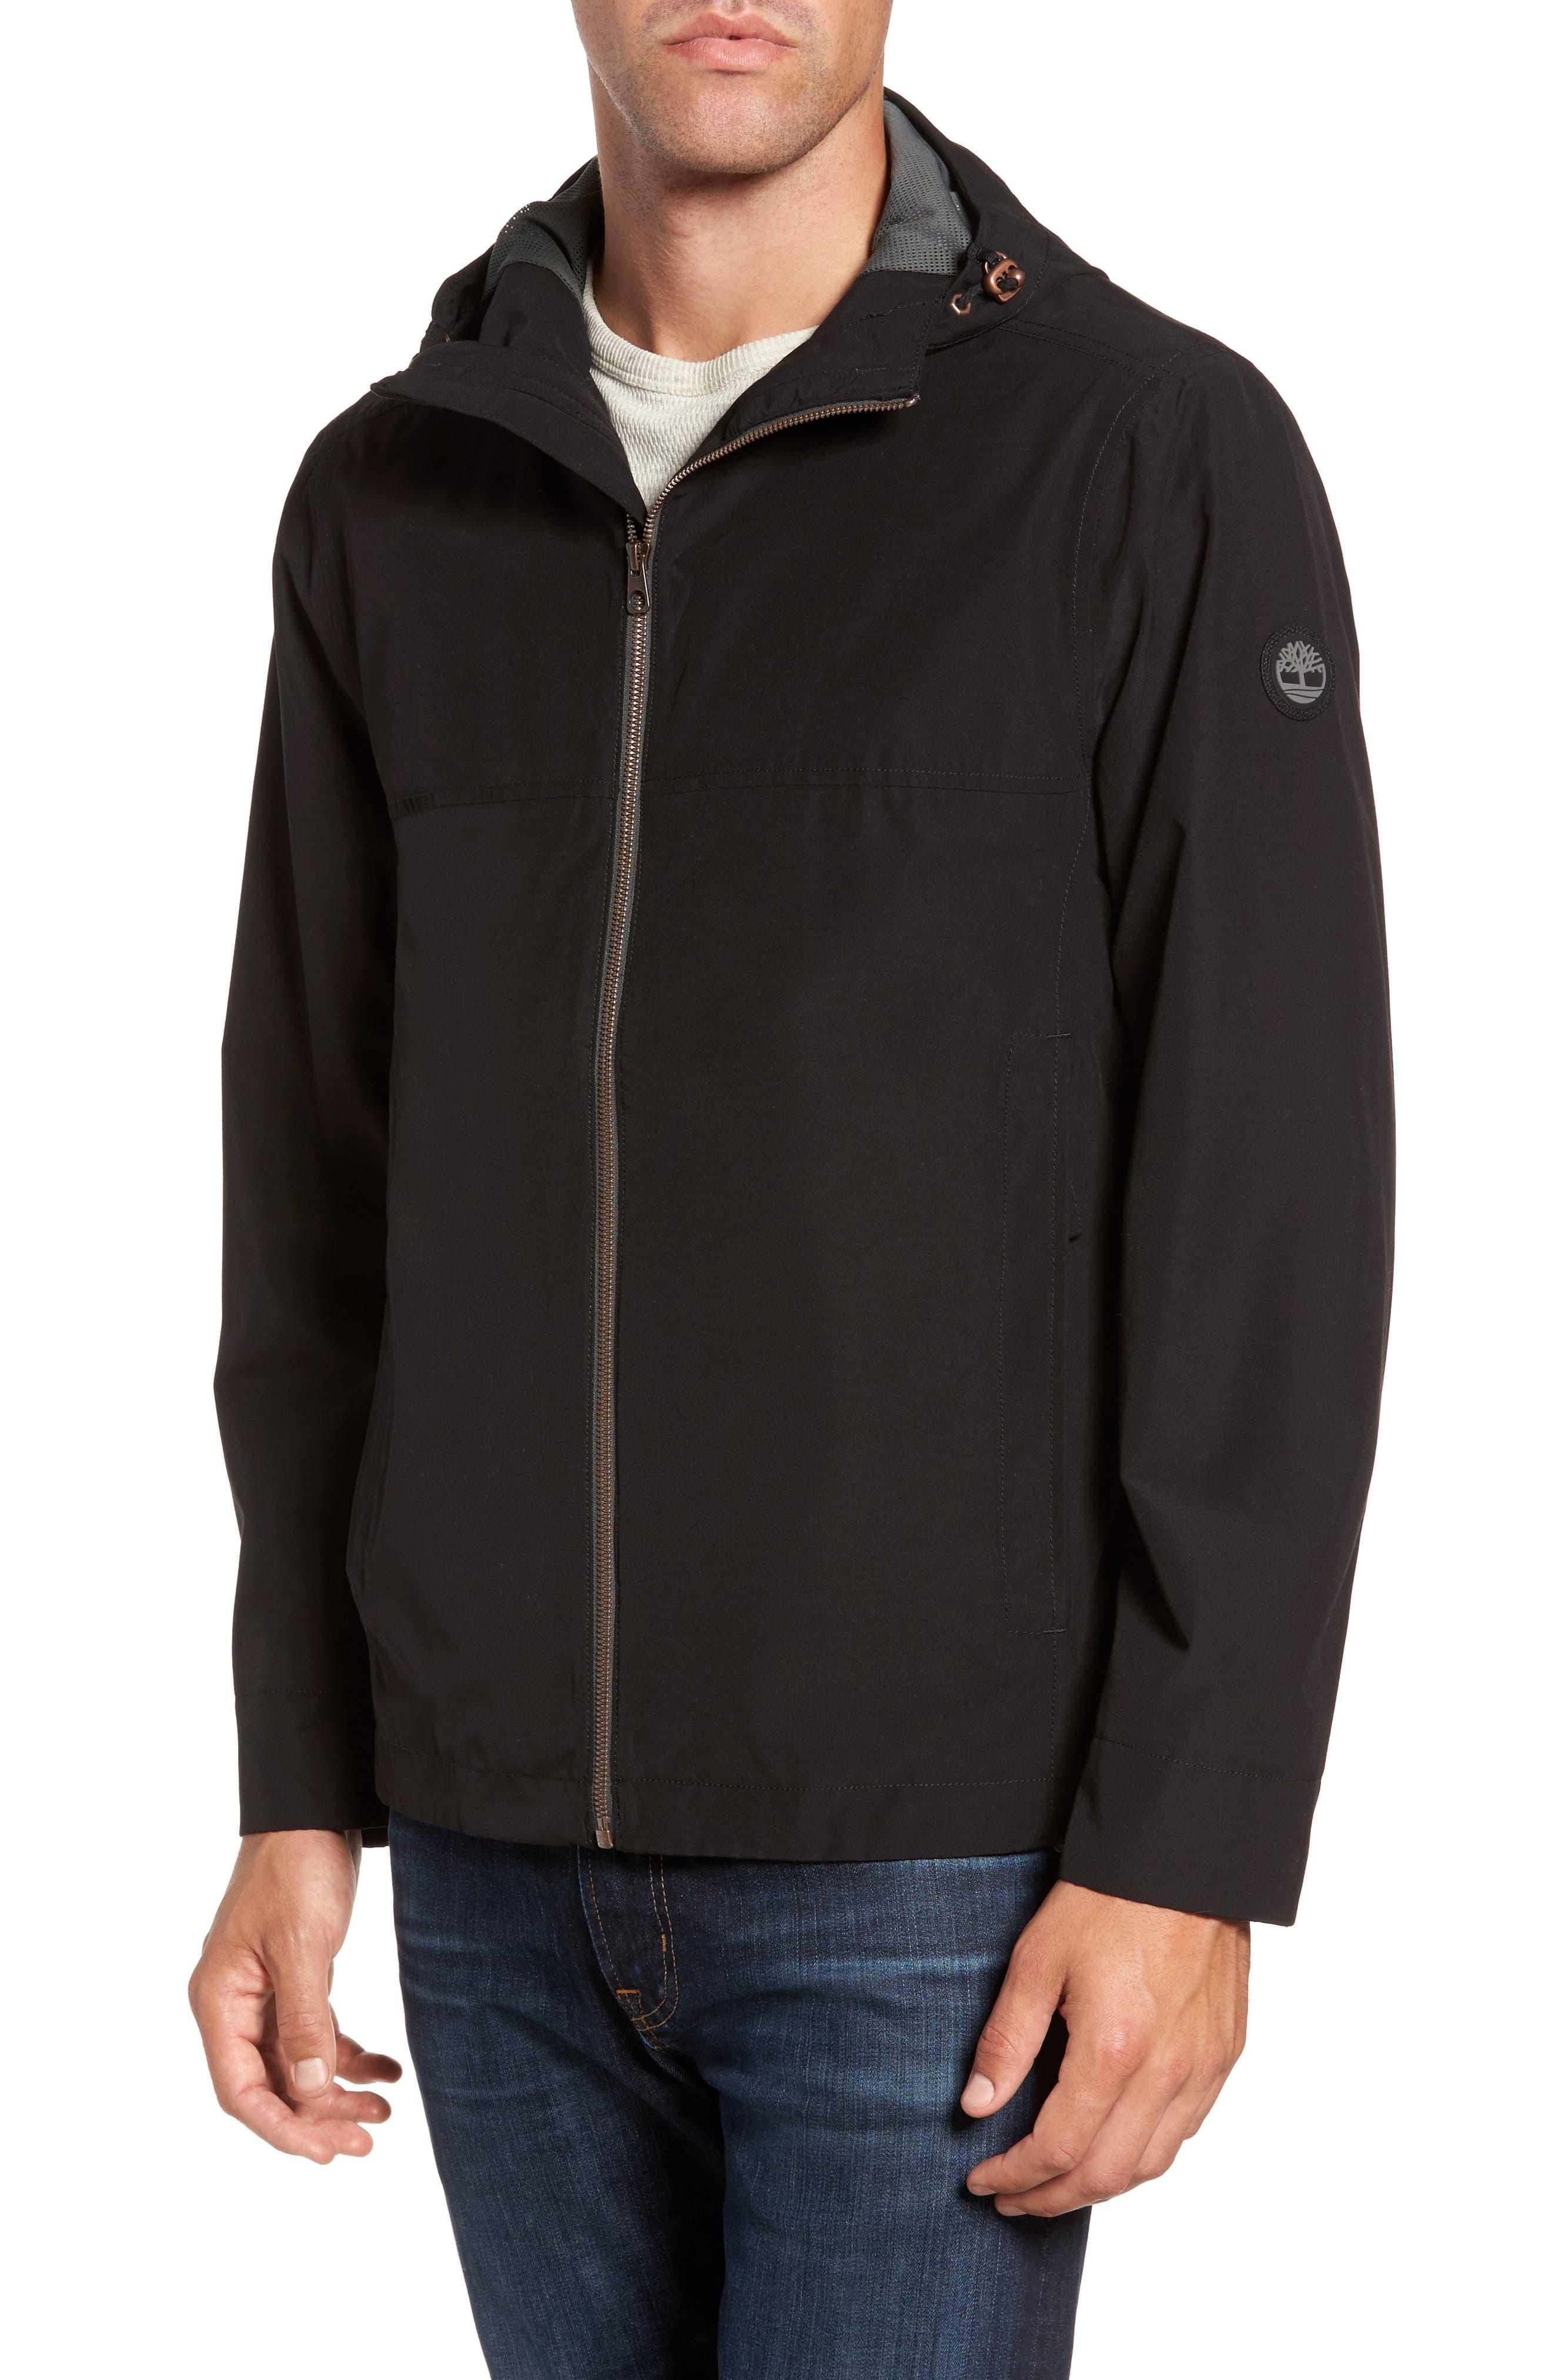 Ragged Mountain Packable Waterproof Jacket,                             Main thumbnail 1, color,                             Black